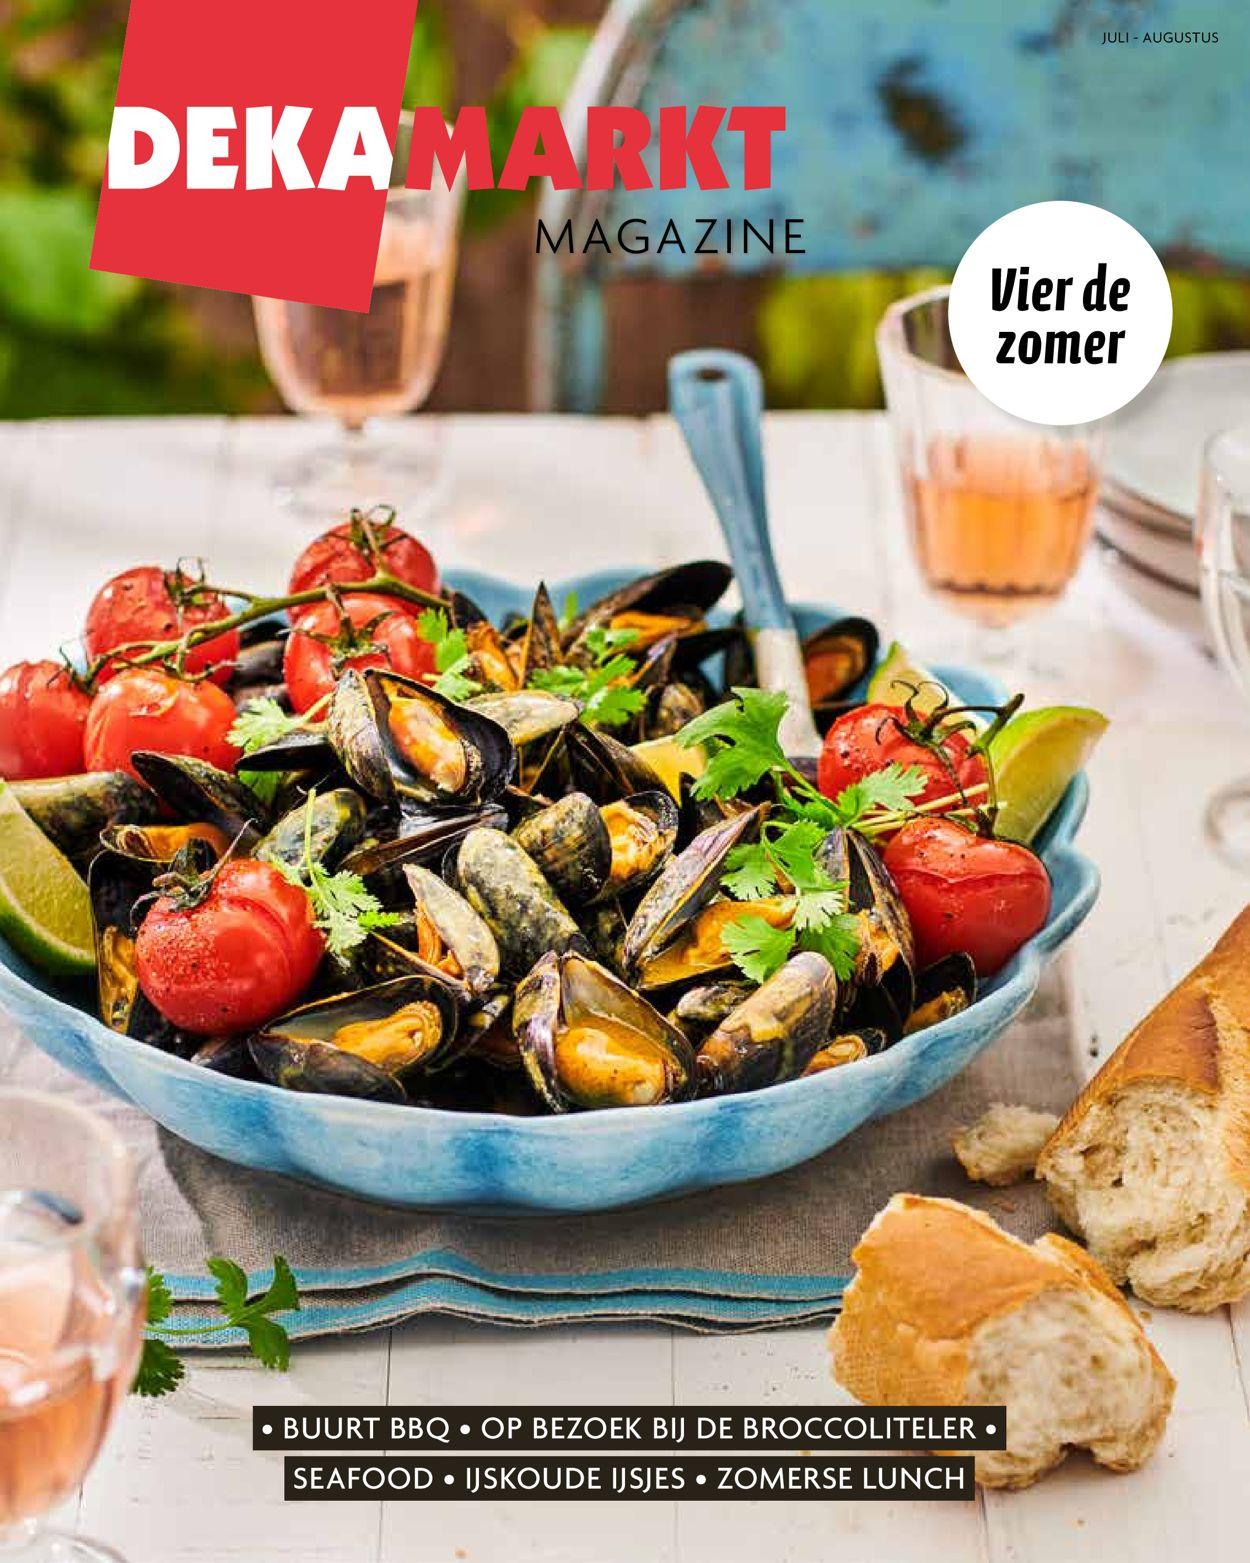 Dekamarkt Folder - 15.07-16.08.2019